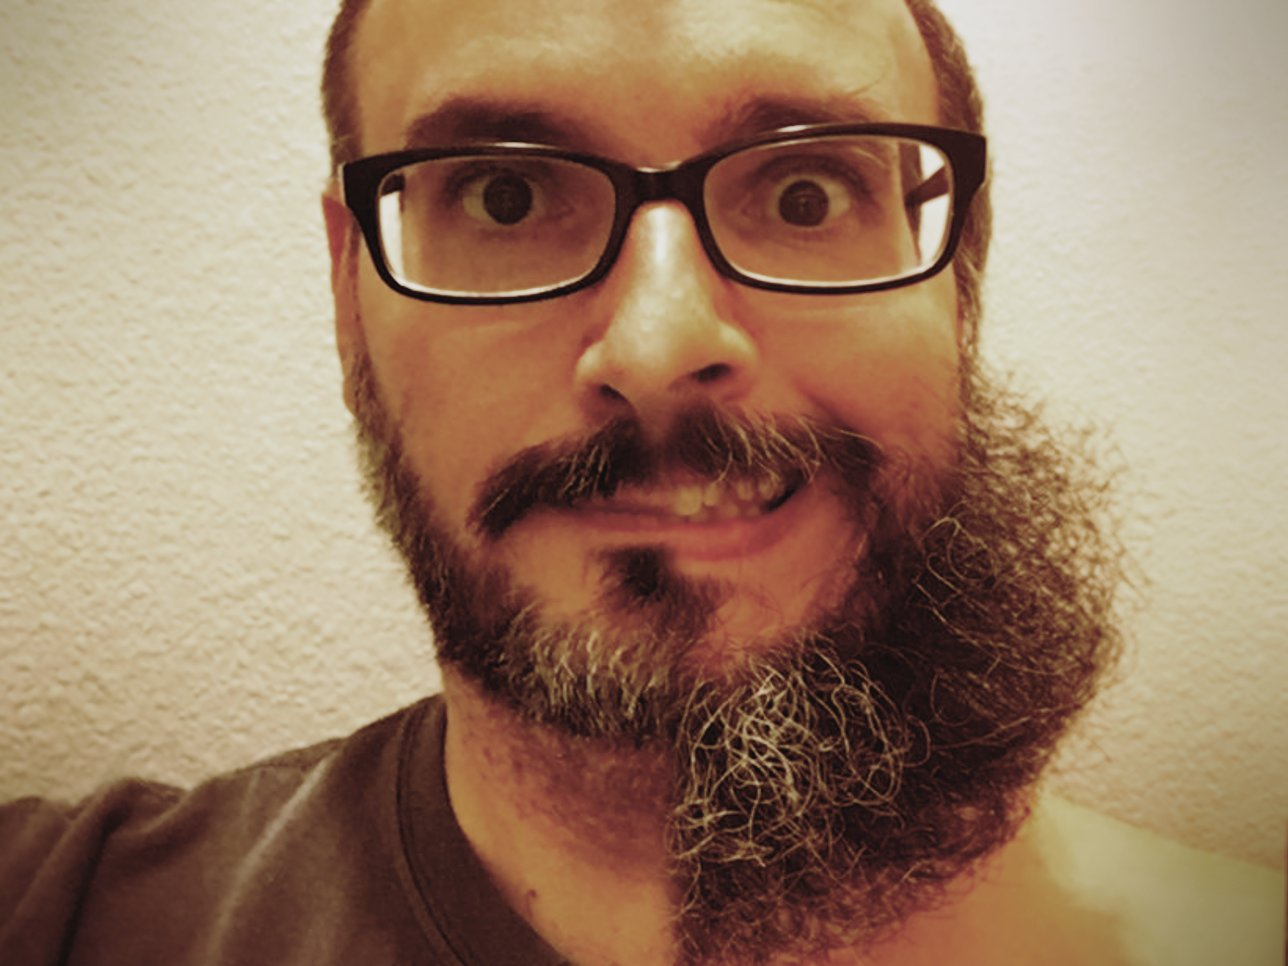 Long beard photo